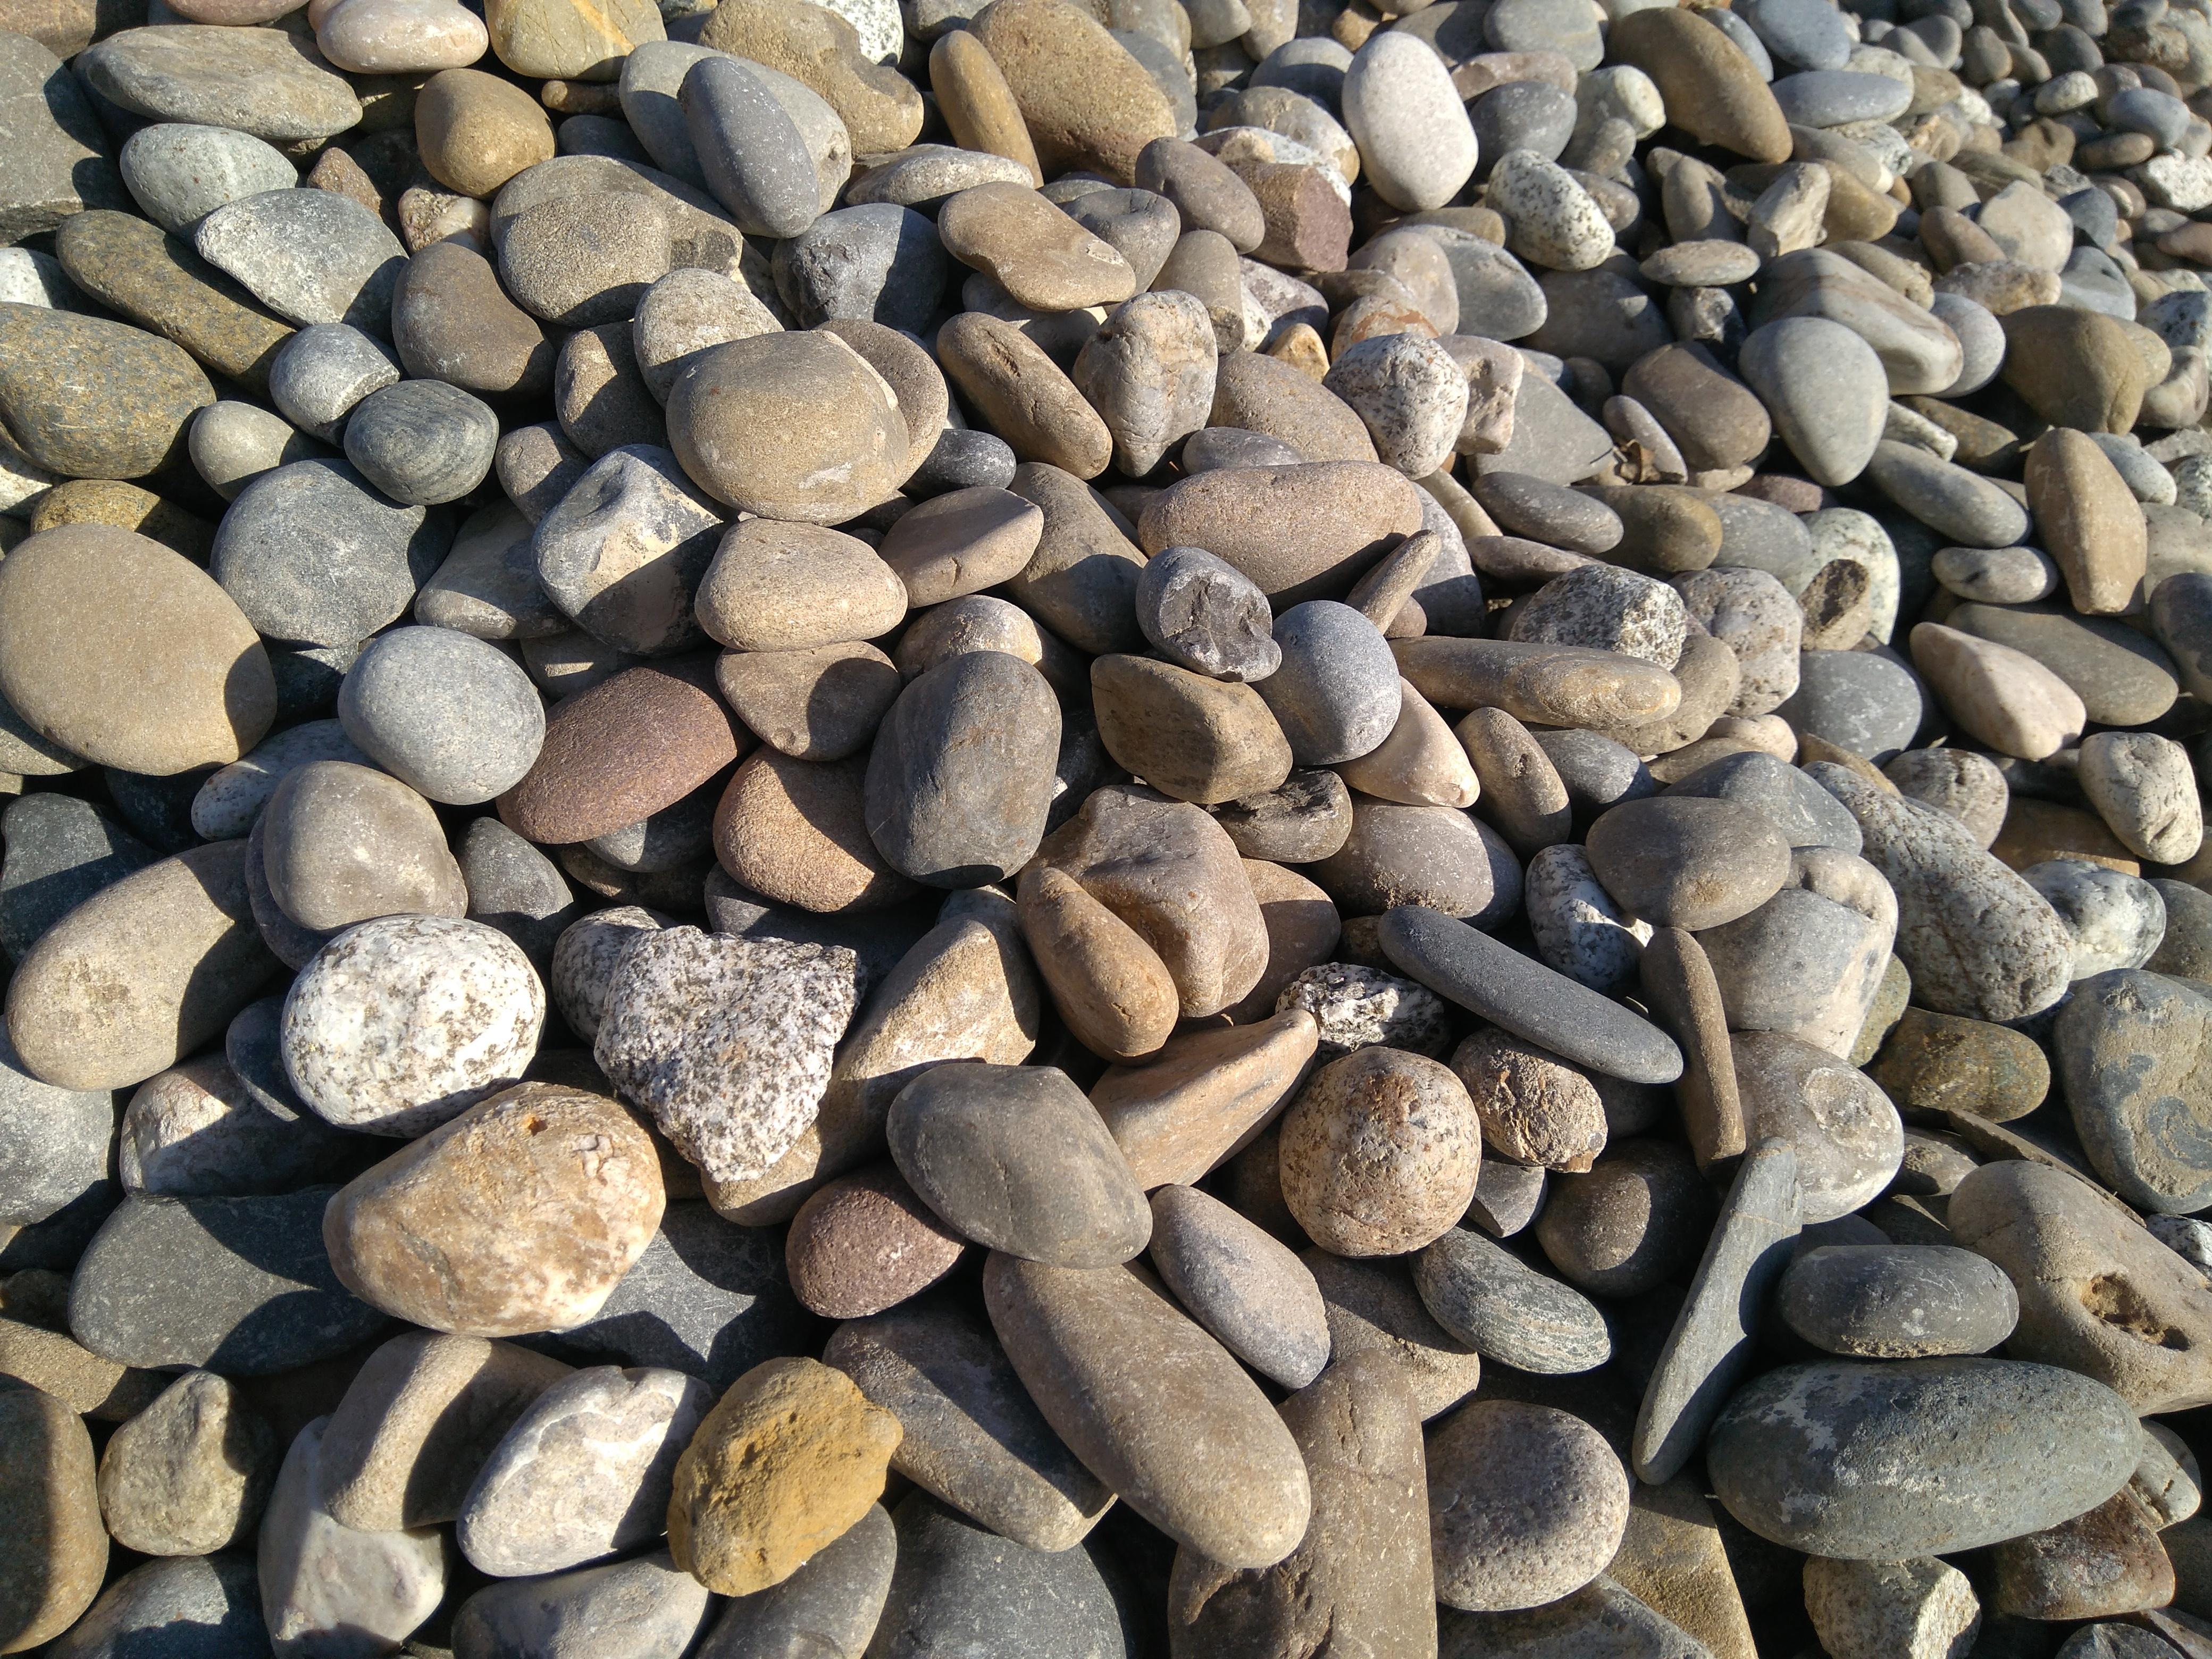 Canto rodado r o gris curient s a for Piedra de rio blanca precio